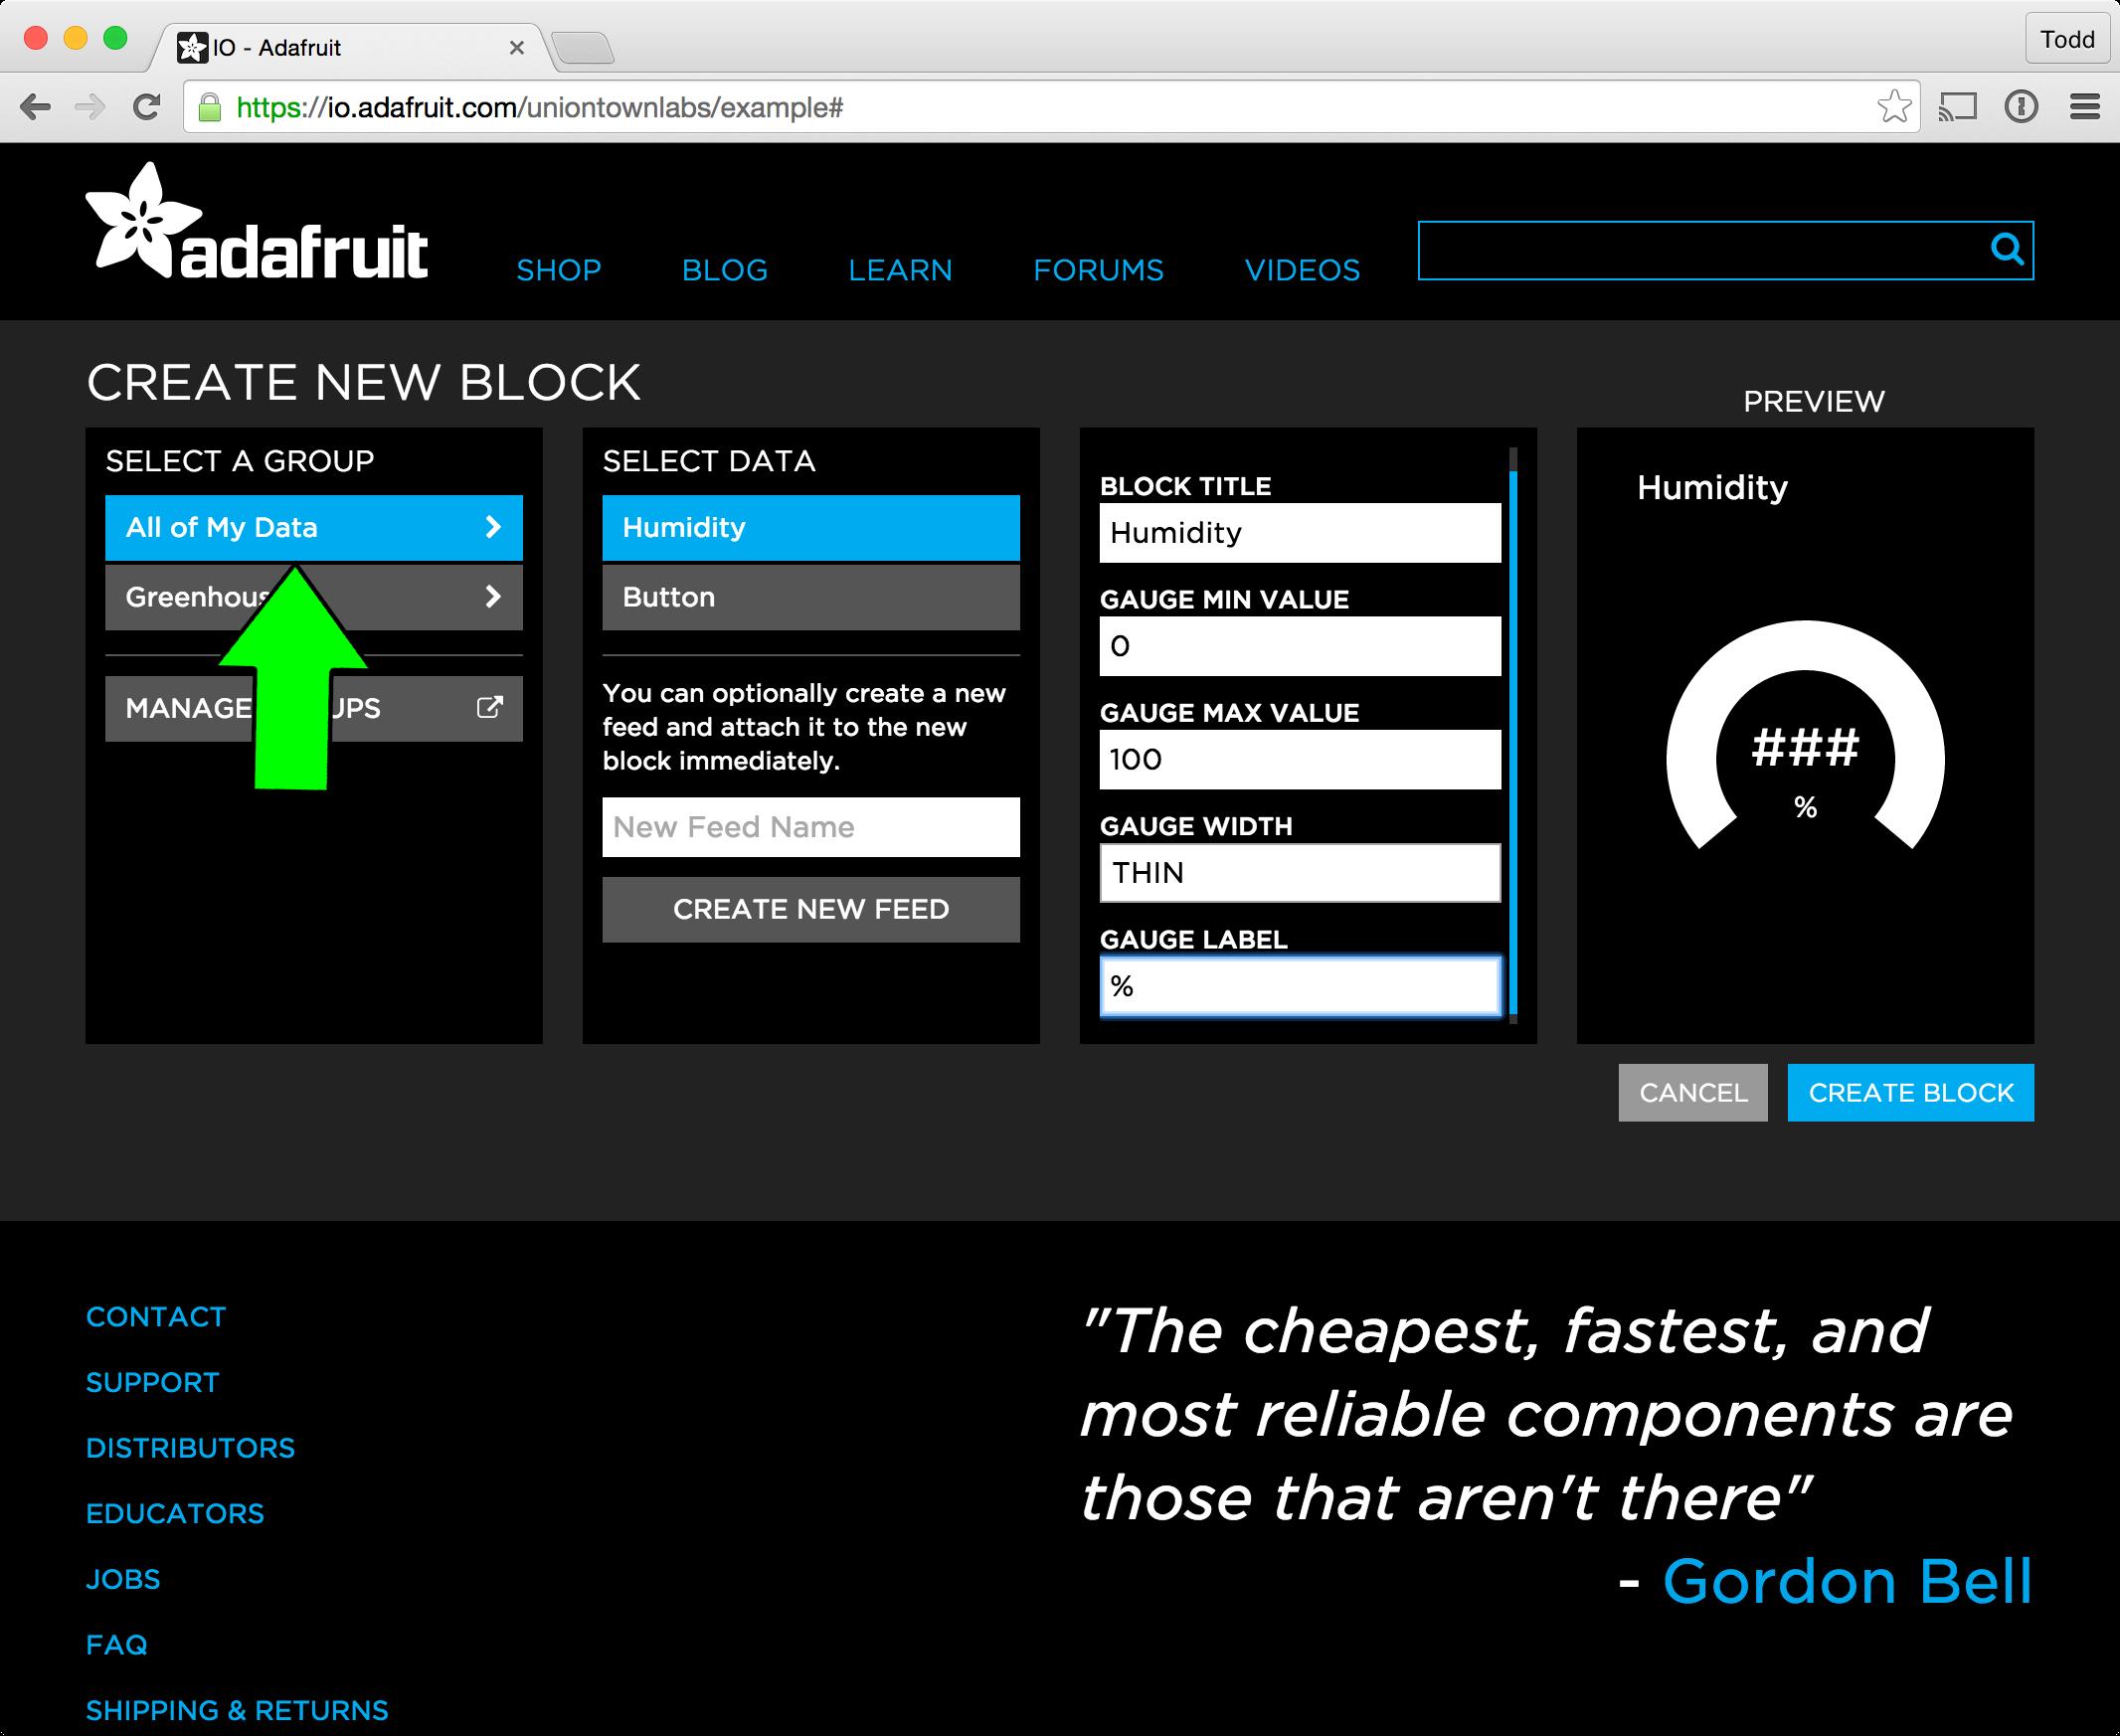 adafruit_io_new_block1.png